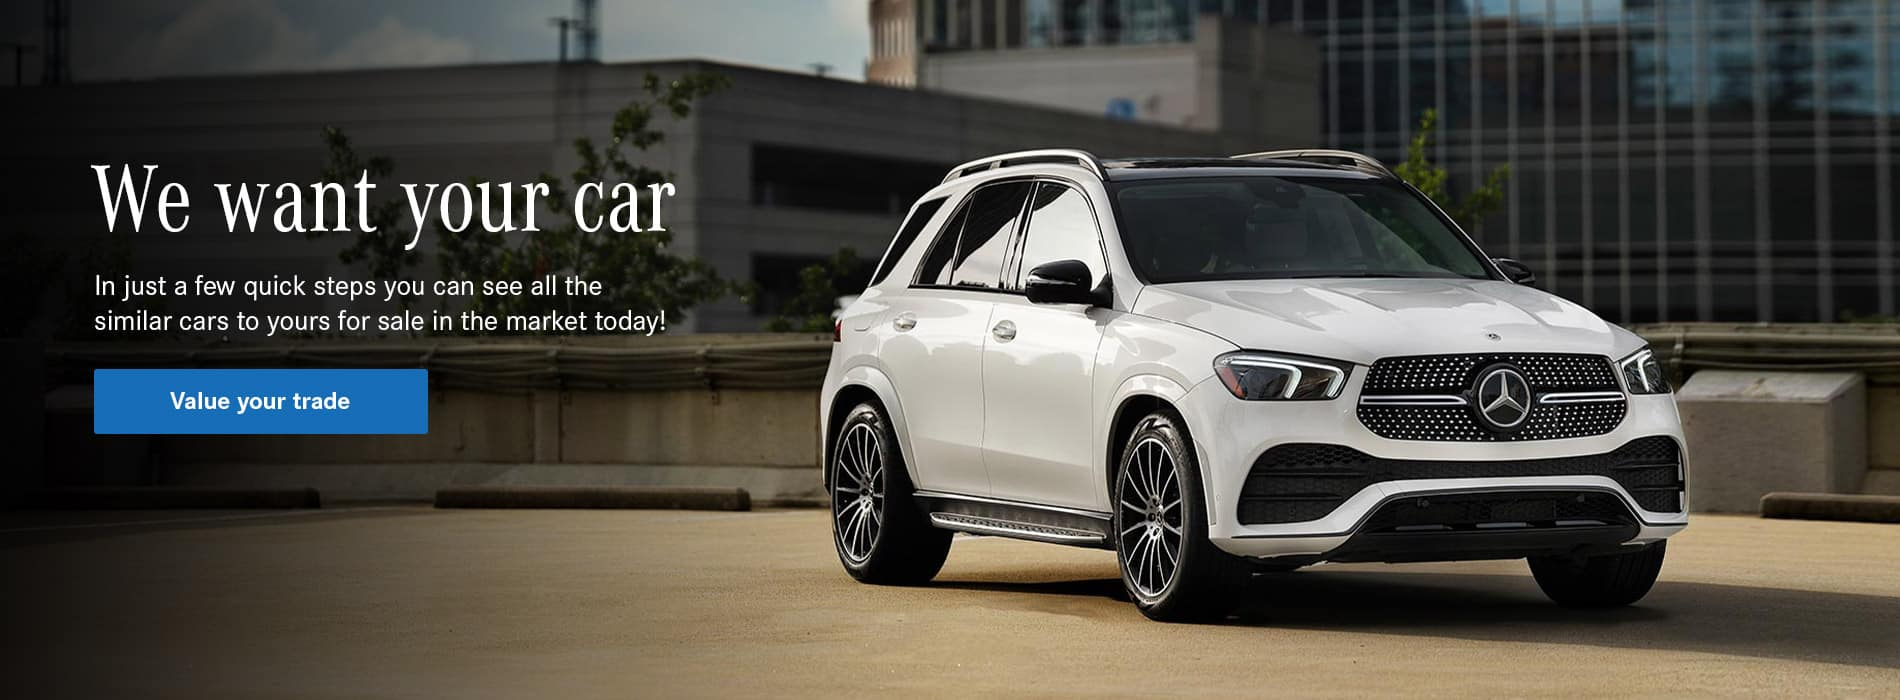 Mercedes-1900×700-Oct-WantYourCar